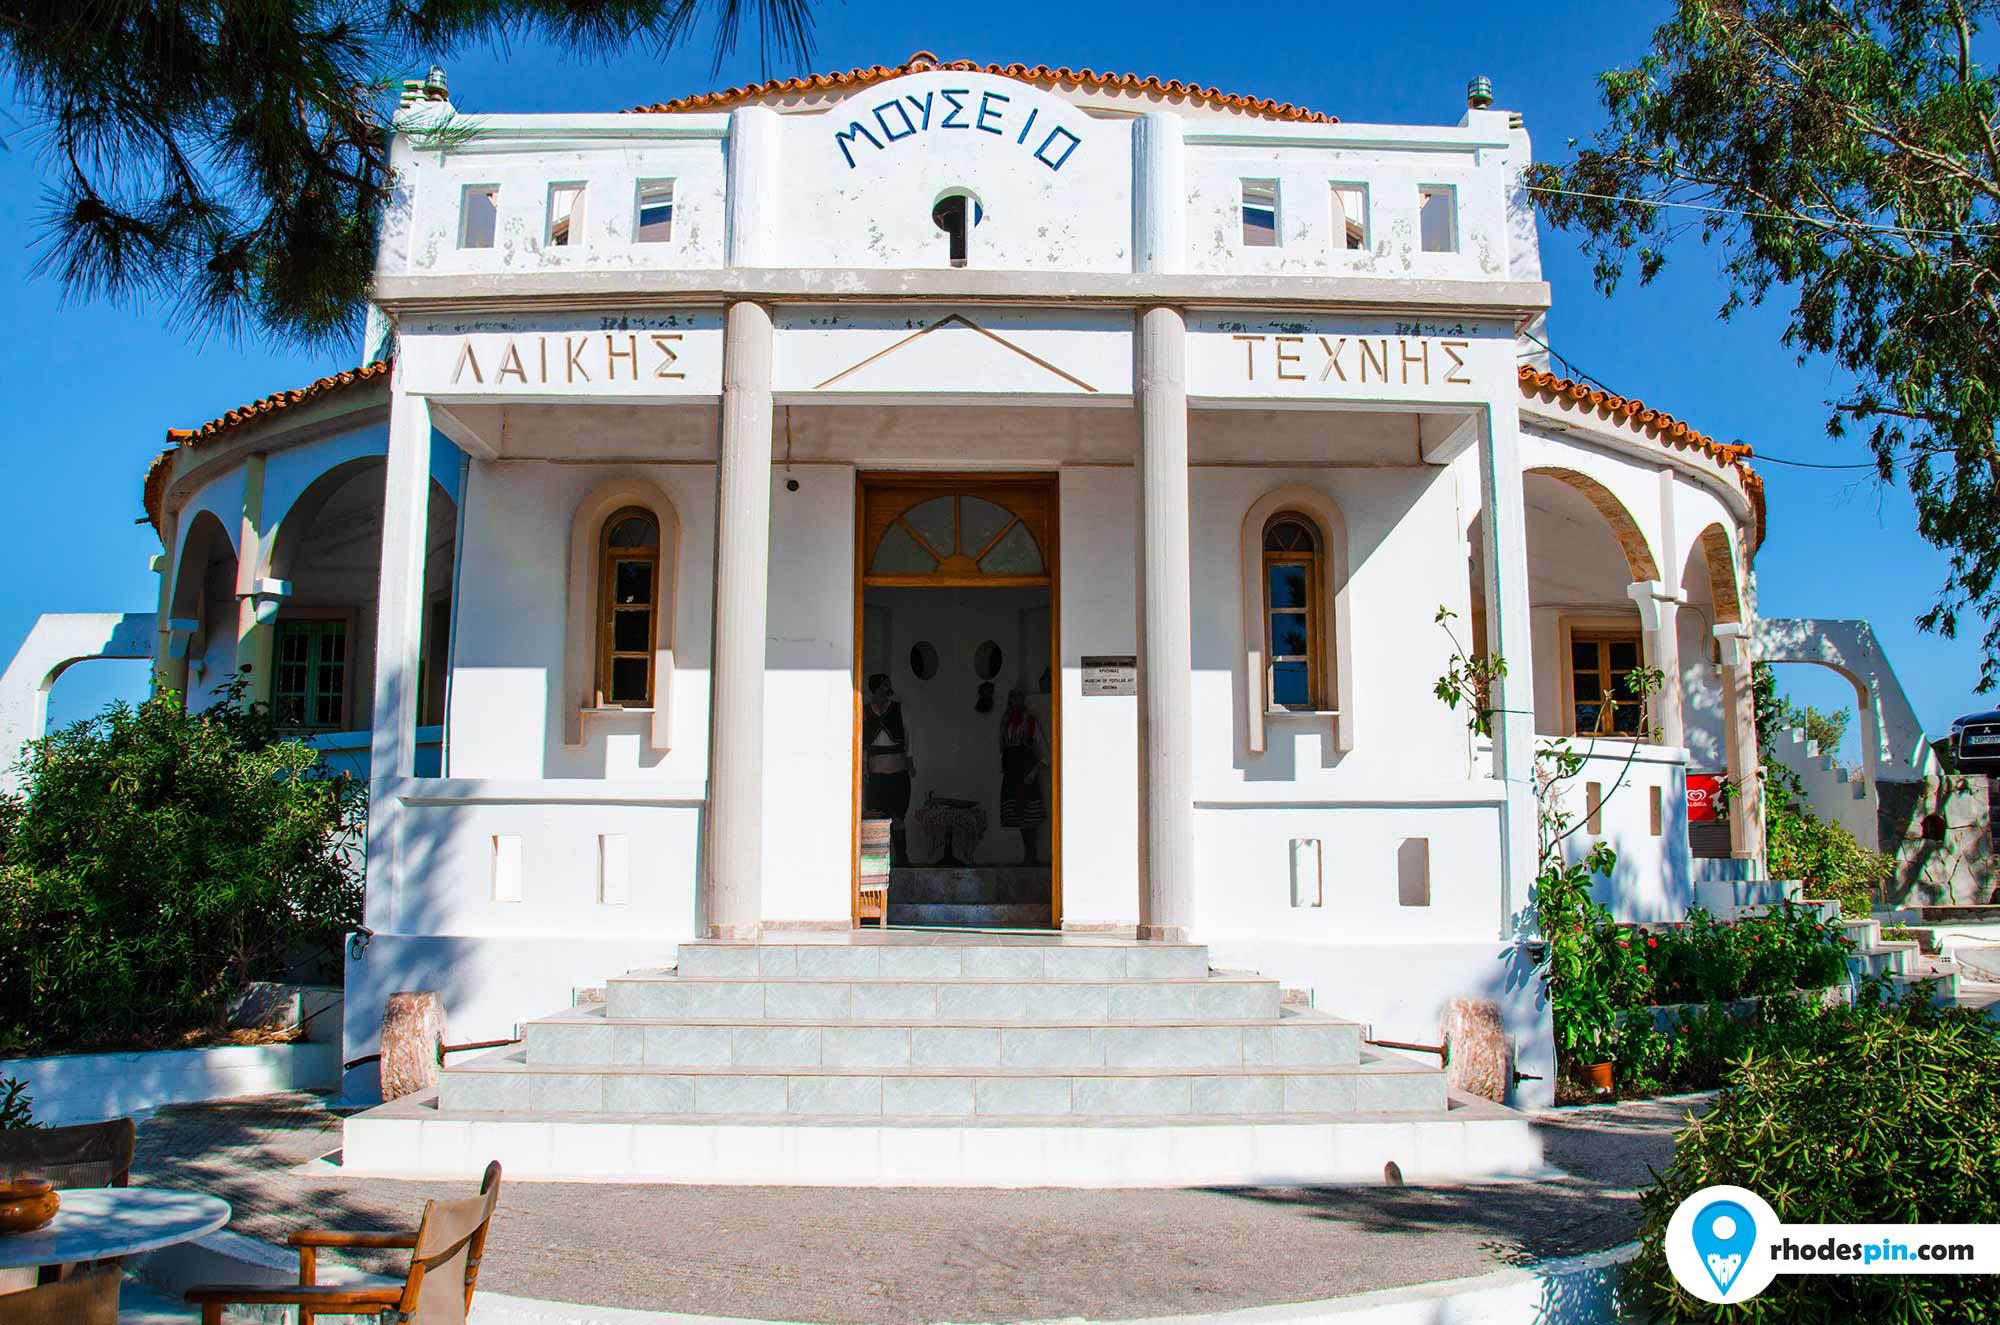 Kritinia Folkrone museum Rhods island